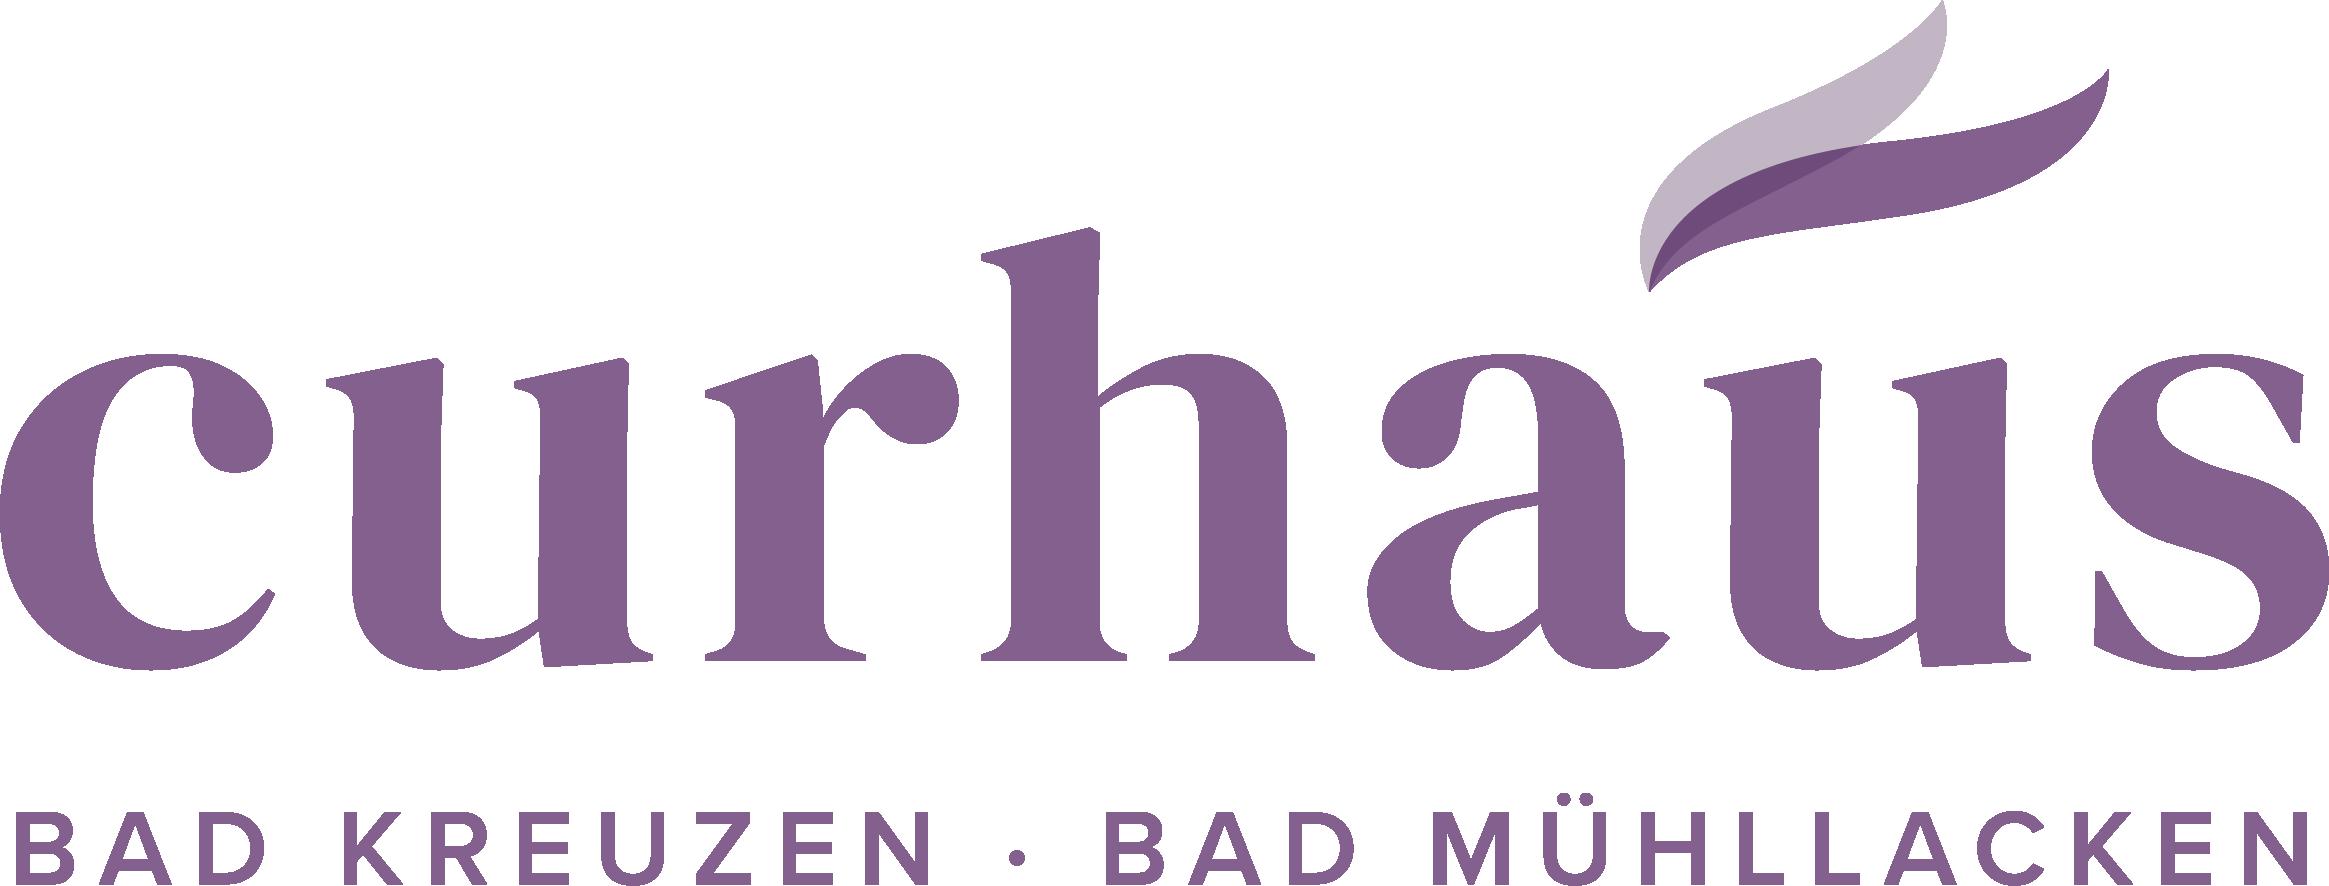 Logo Bad Kreuzen Curhaus